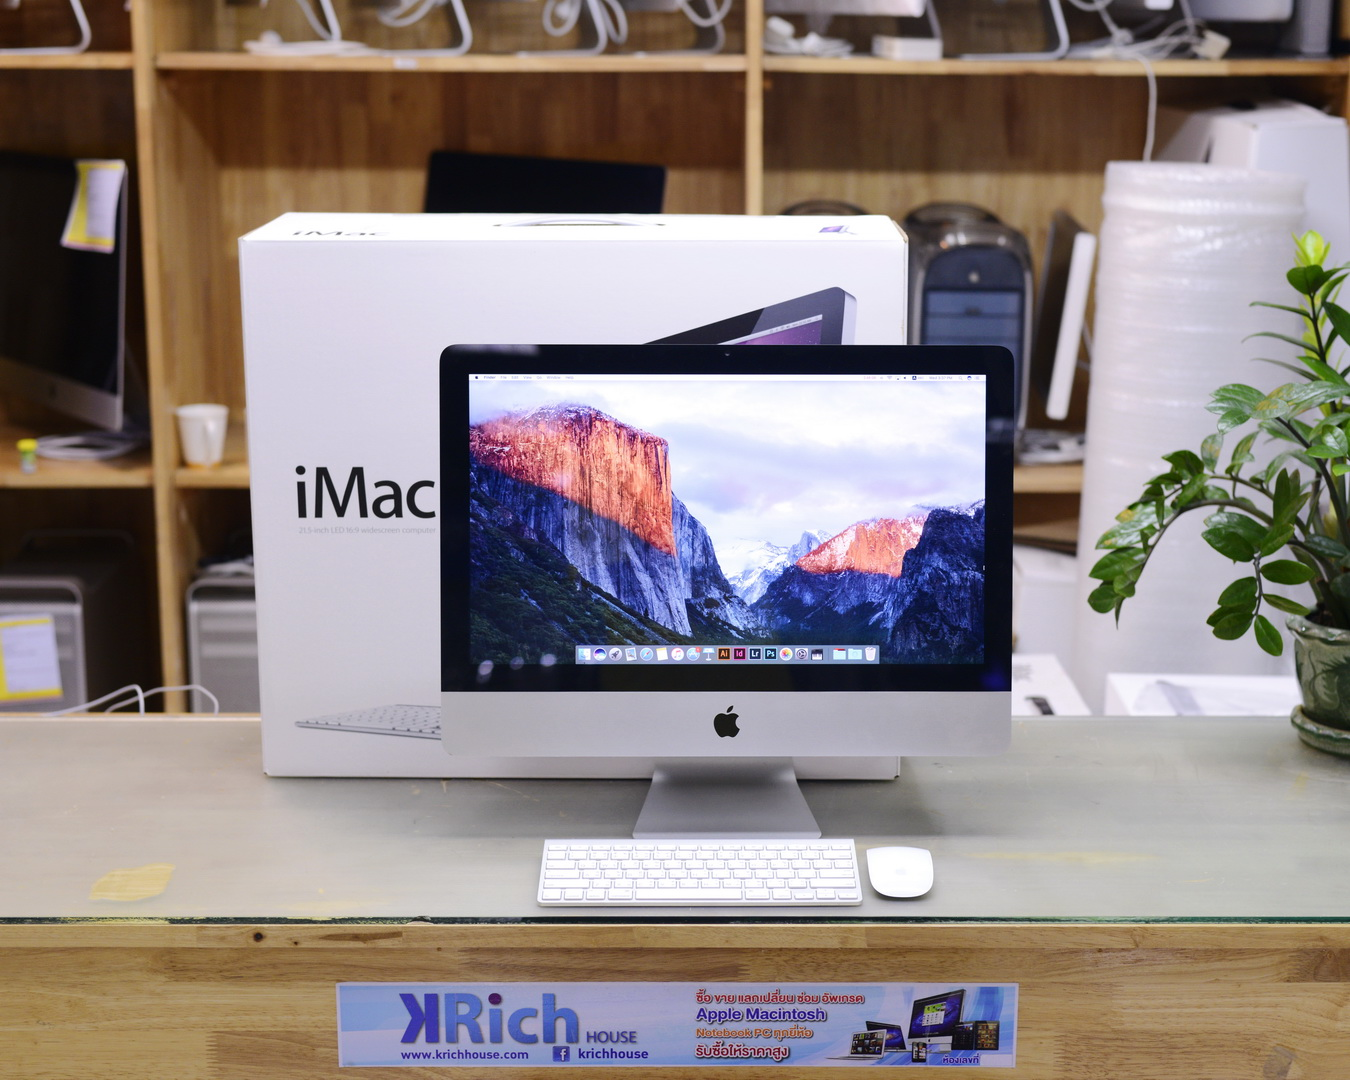 iMac (21.5-inch Mid 2011) Quad-Core i5 2.7GHz RAM 4GB HDD 1TB AMD Radeon HD 6770 512MB - Fullbox